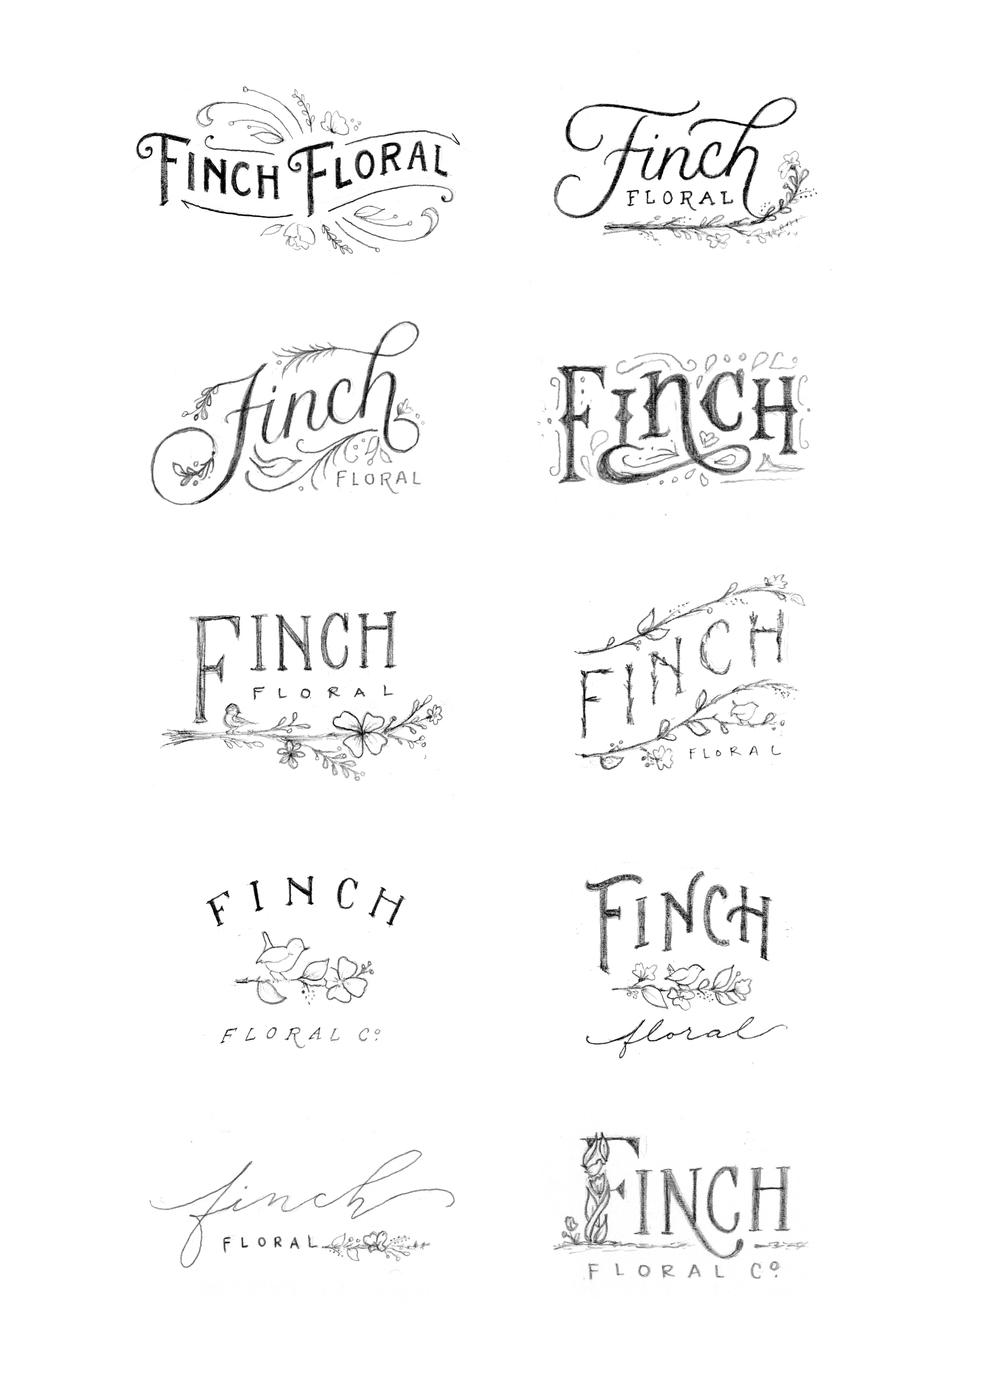 Finch Floral Branding by Wink & Wonder